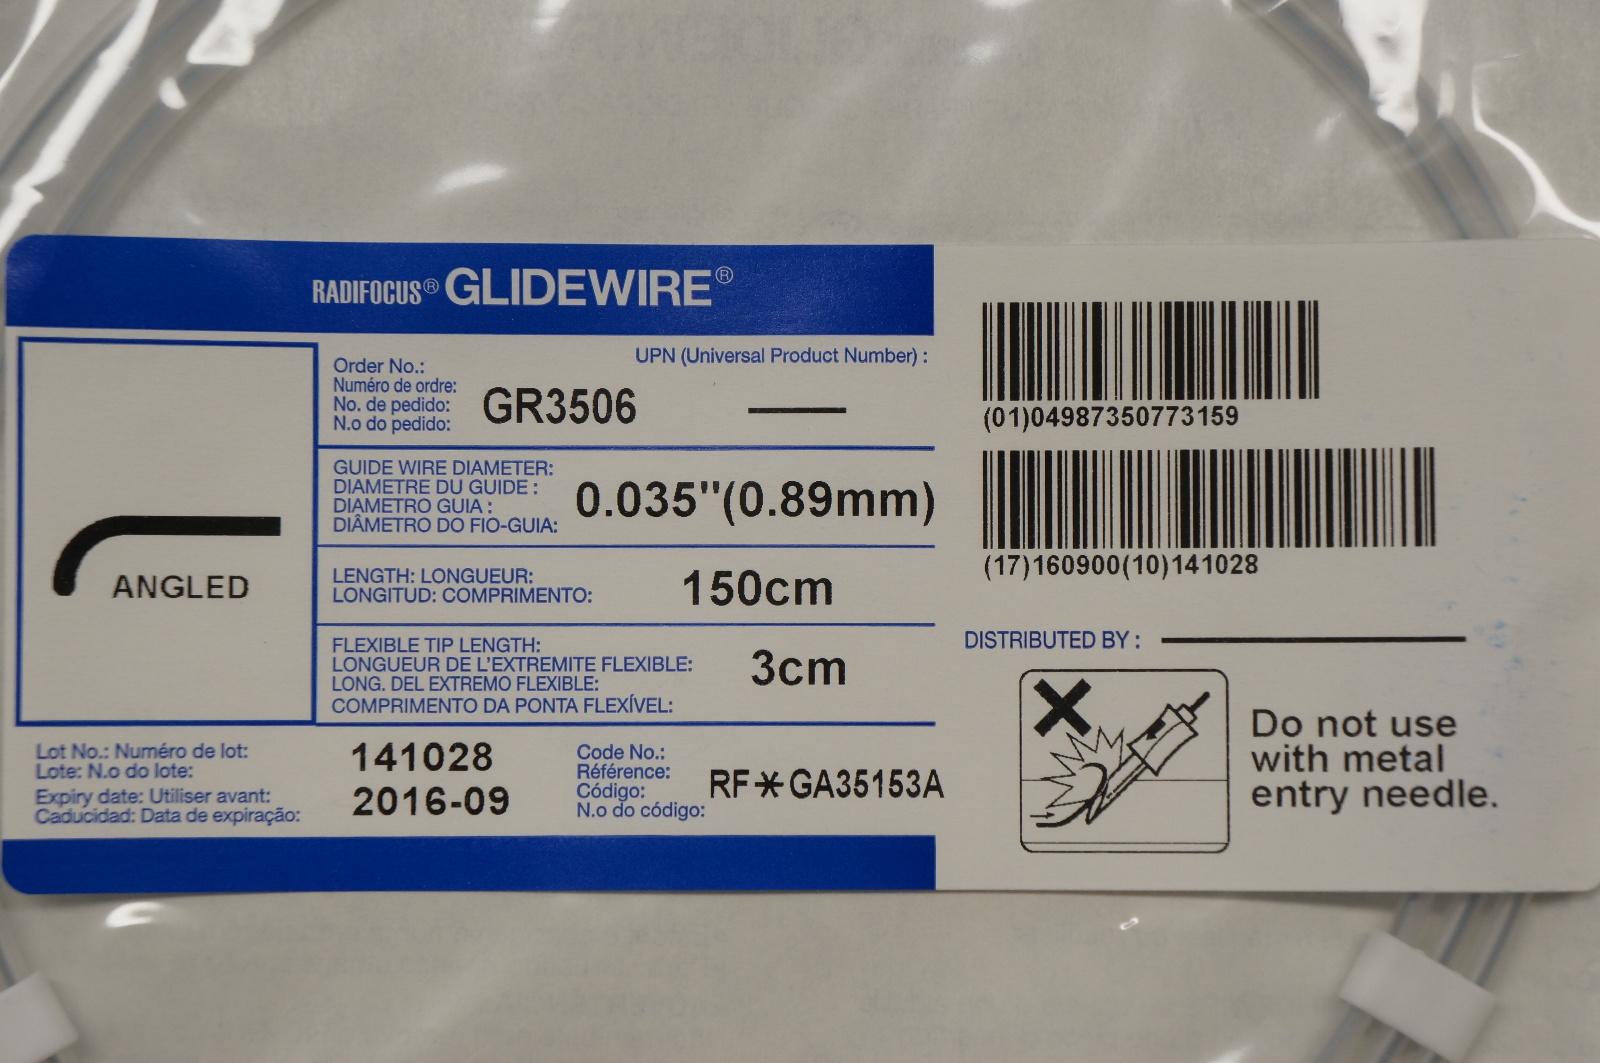 Terumo GR3506 Radifocus Glidewire Angled, 0.035 | eBay